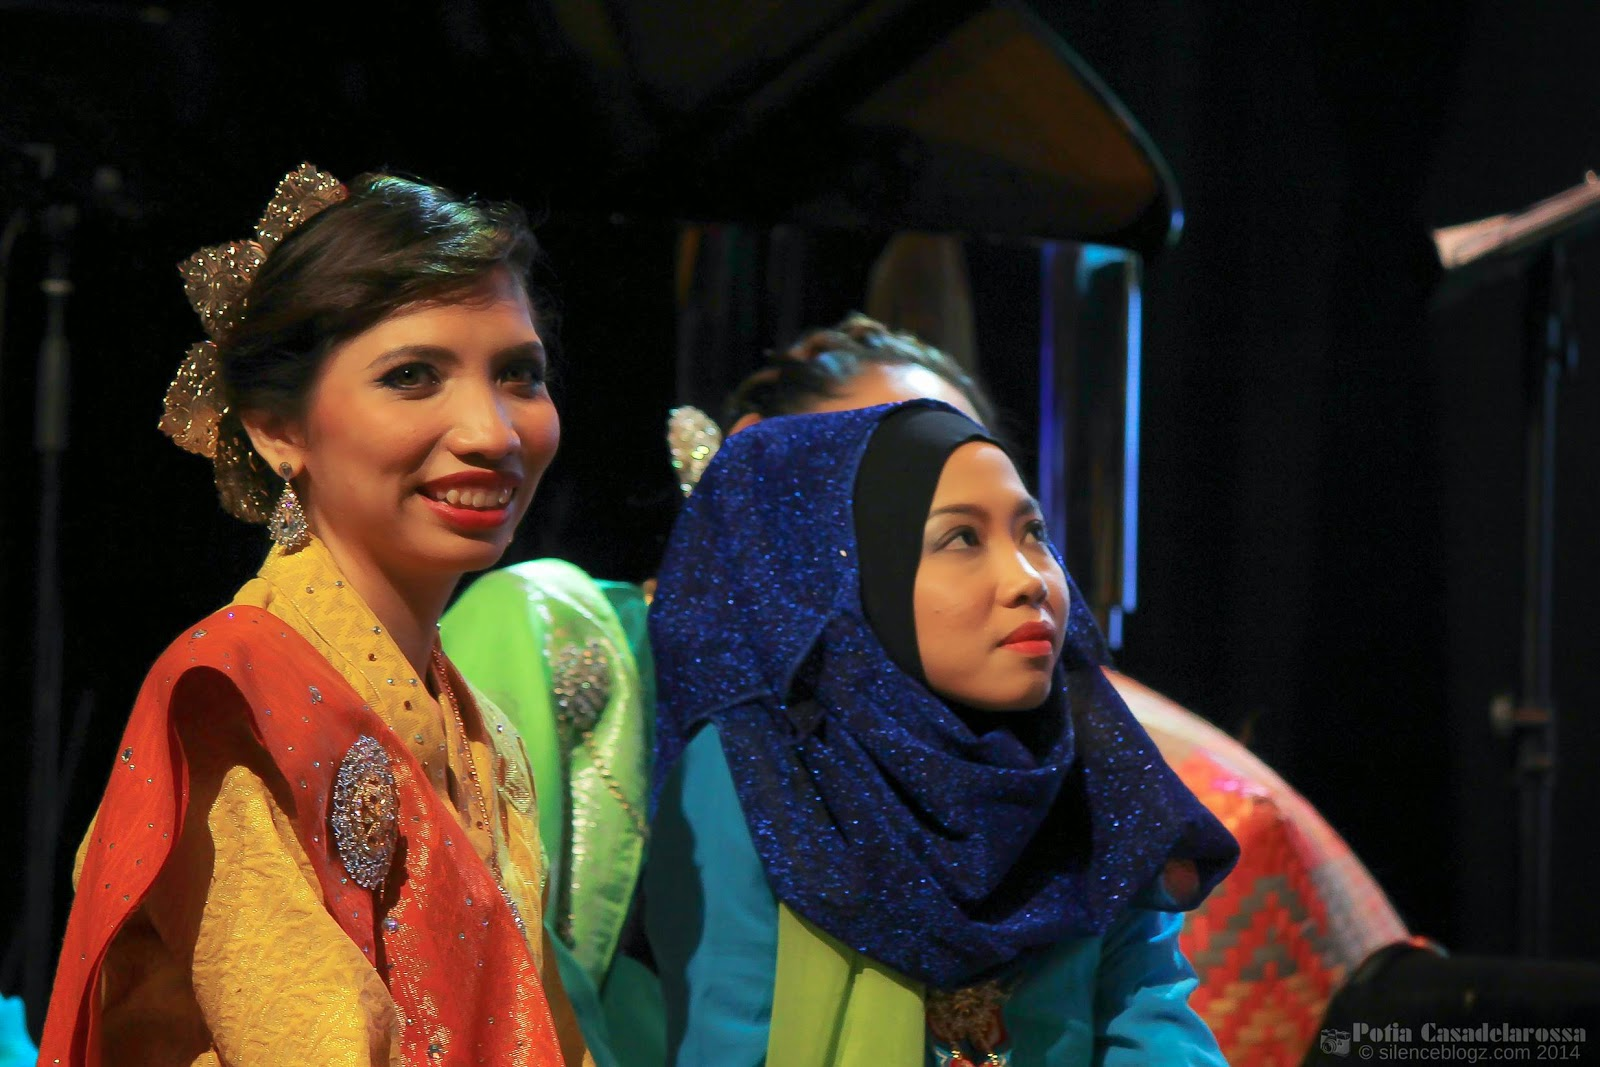 Nur Hidayah Jamaluddin dan Lilis Syafuza - Koir Kebangsaan Malaysia Classique